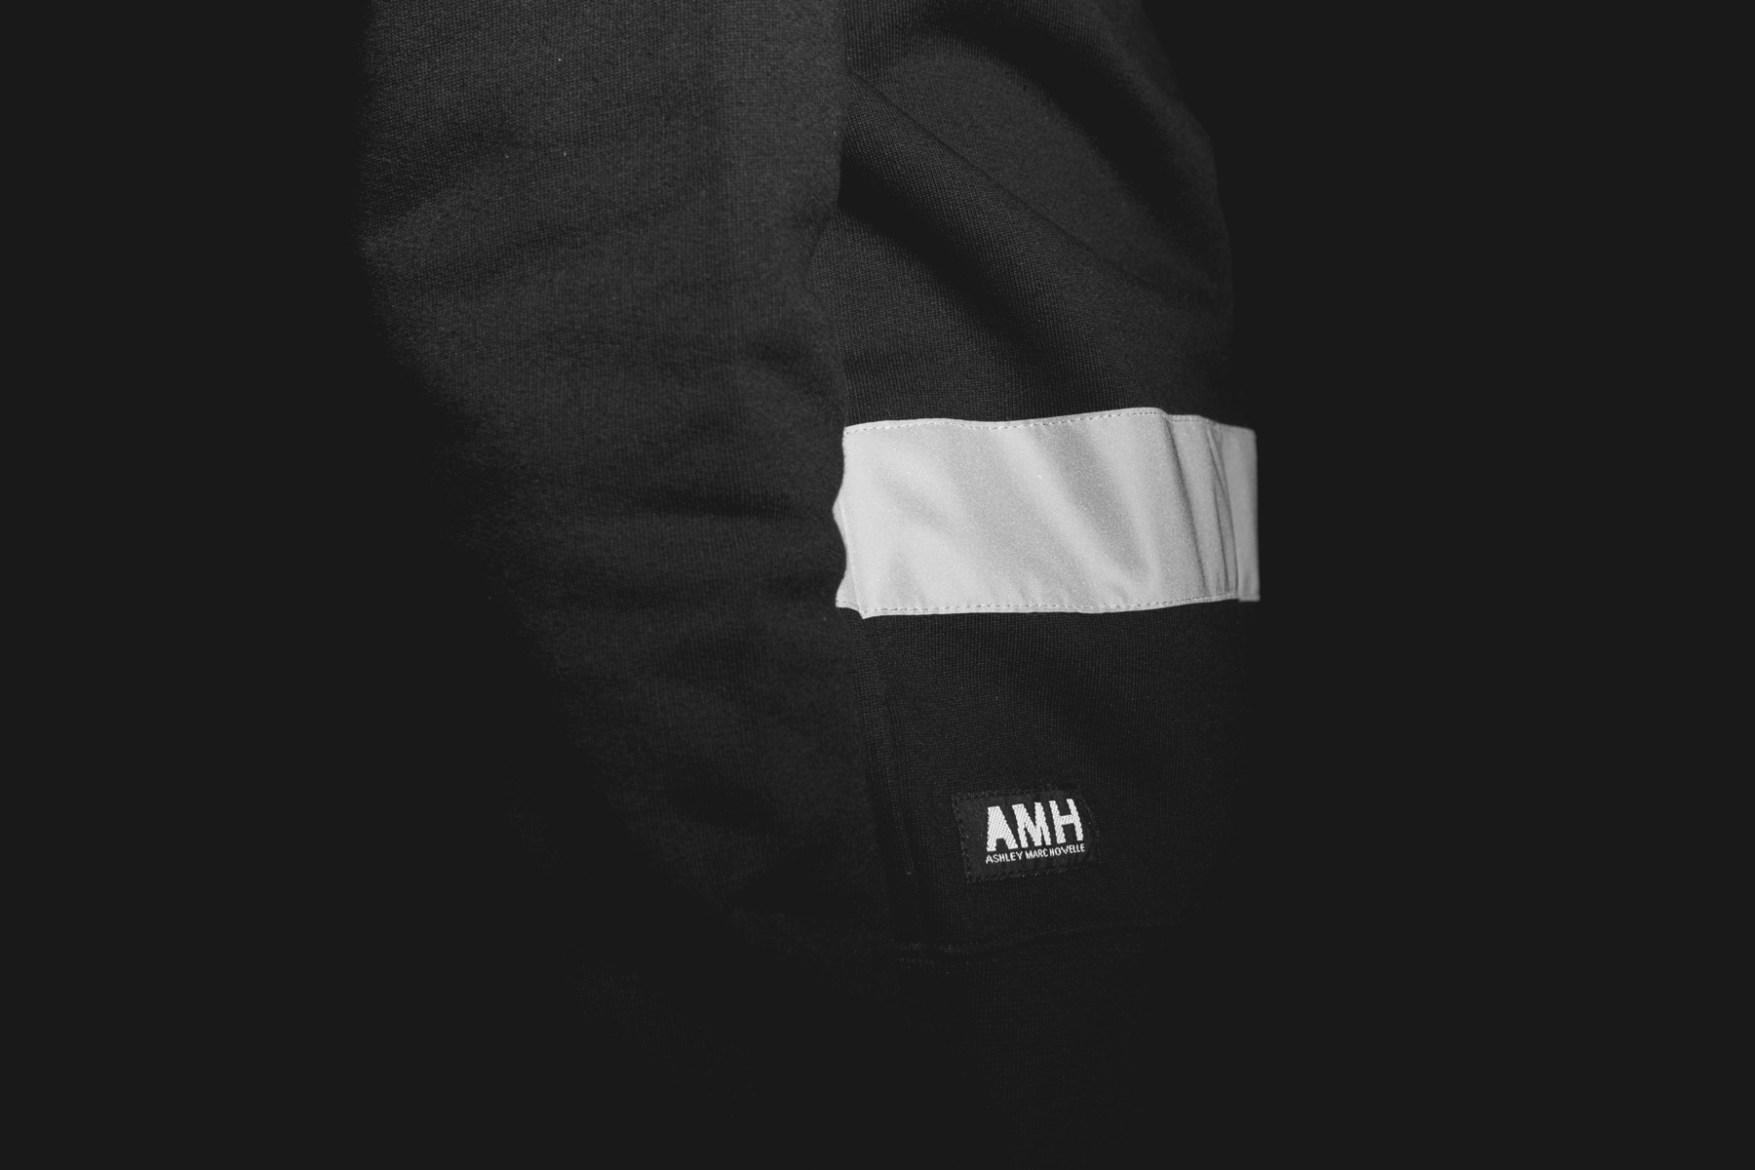 AMH 2014 Reflective Block Panel T-Shirts